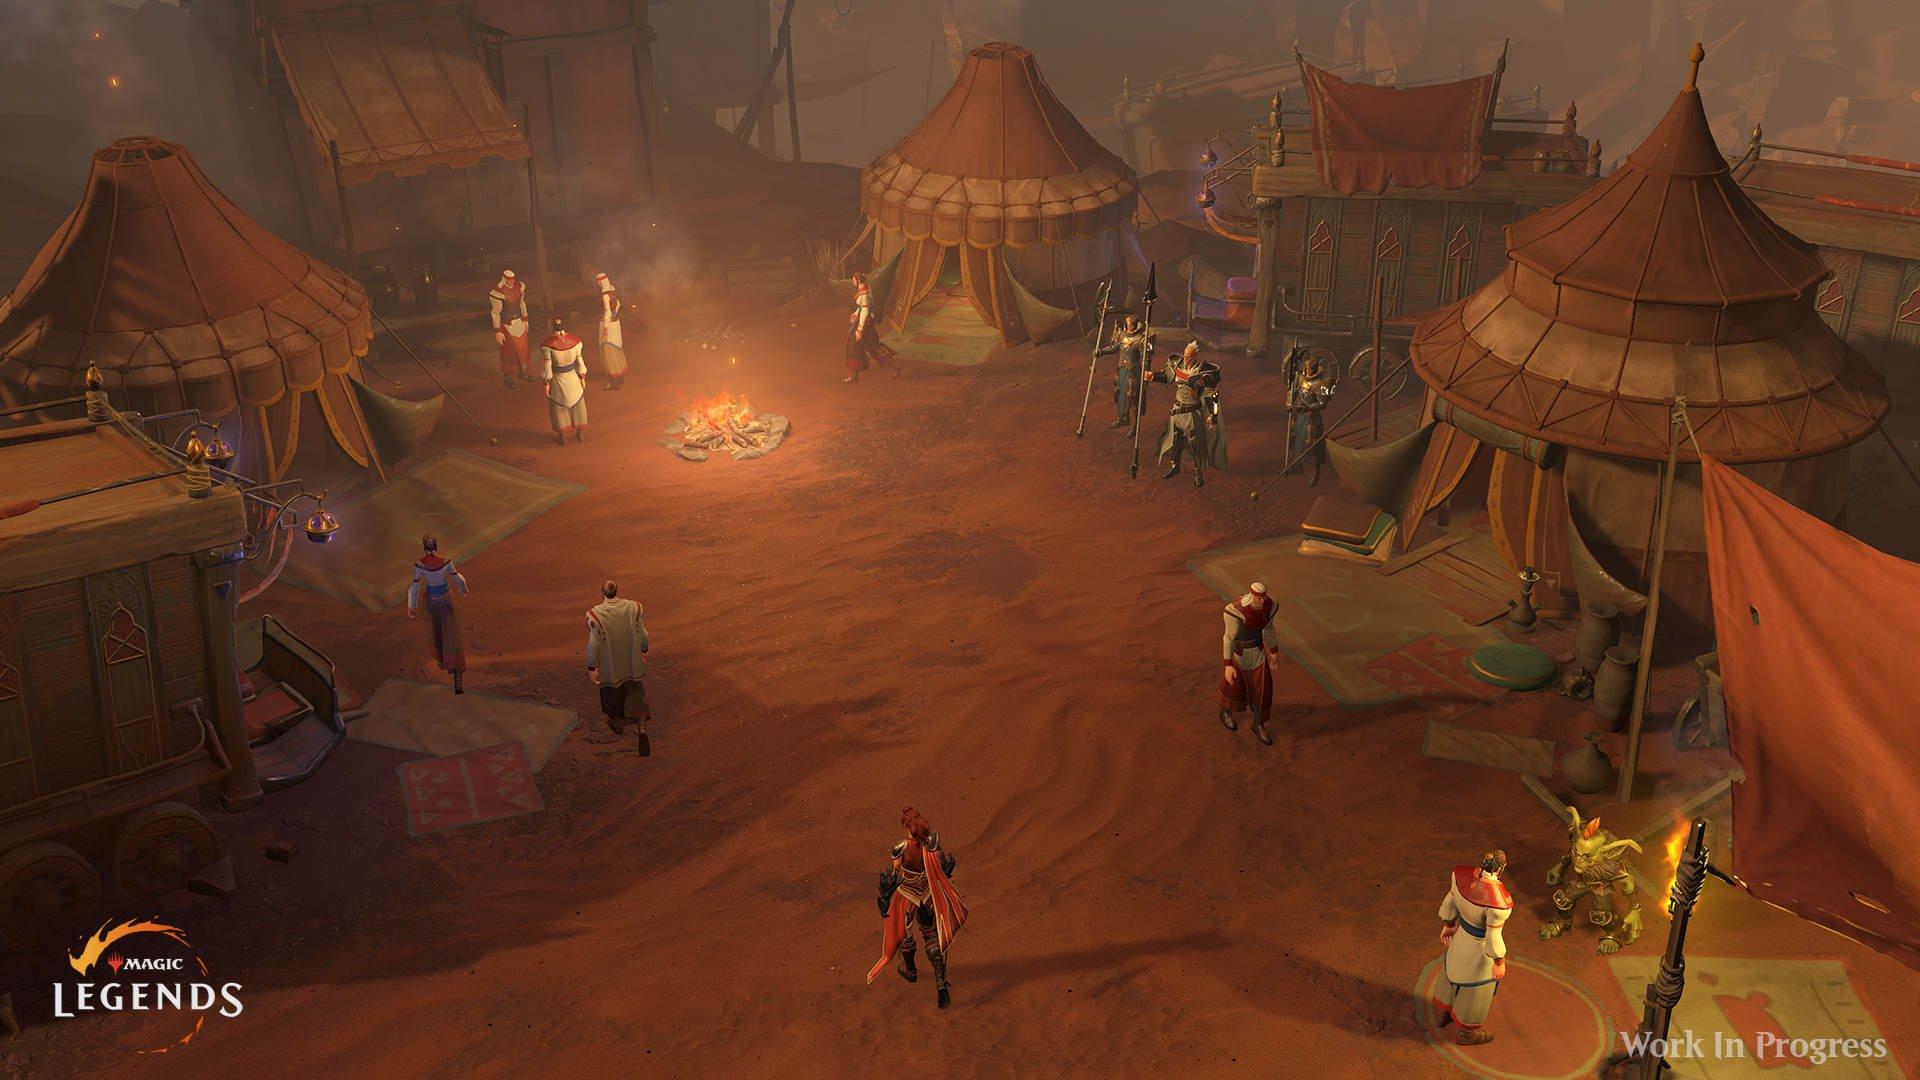 Magic: Legends Magic Legends Overworld Attività schermaglie hub e missioni 1